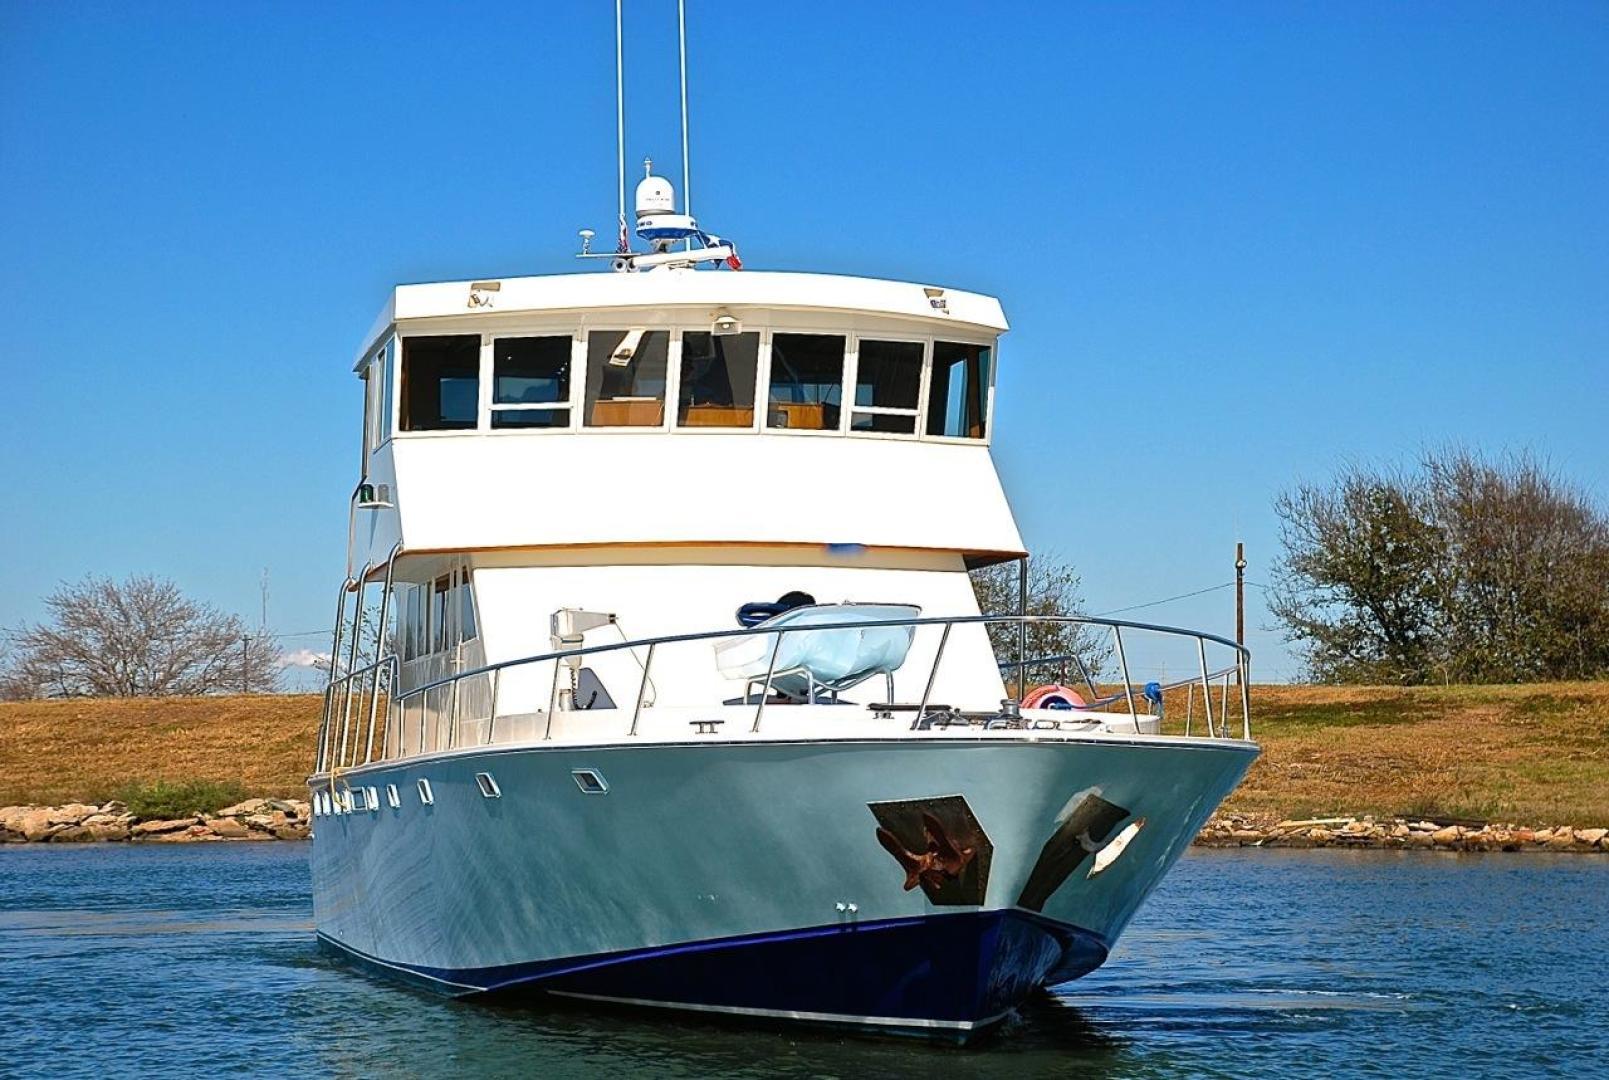 Infinity-Cockpit Motor Yacht 2001-Dont Matter Houston-Texas-United States-Bow Profile-1005585 | Thumbnail